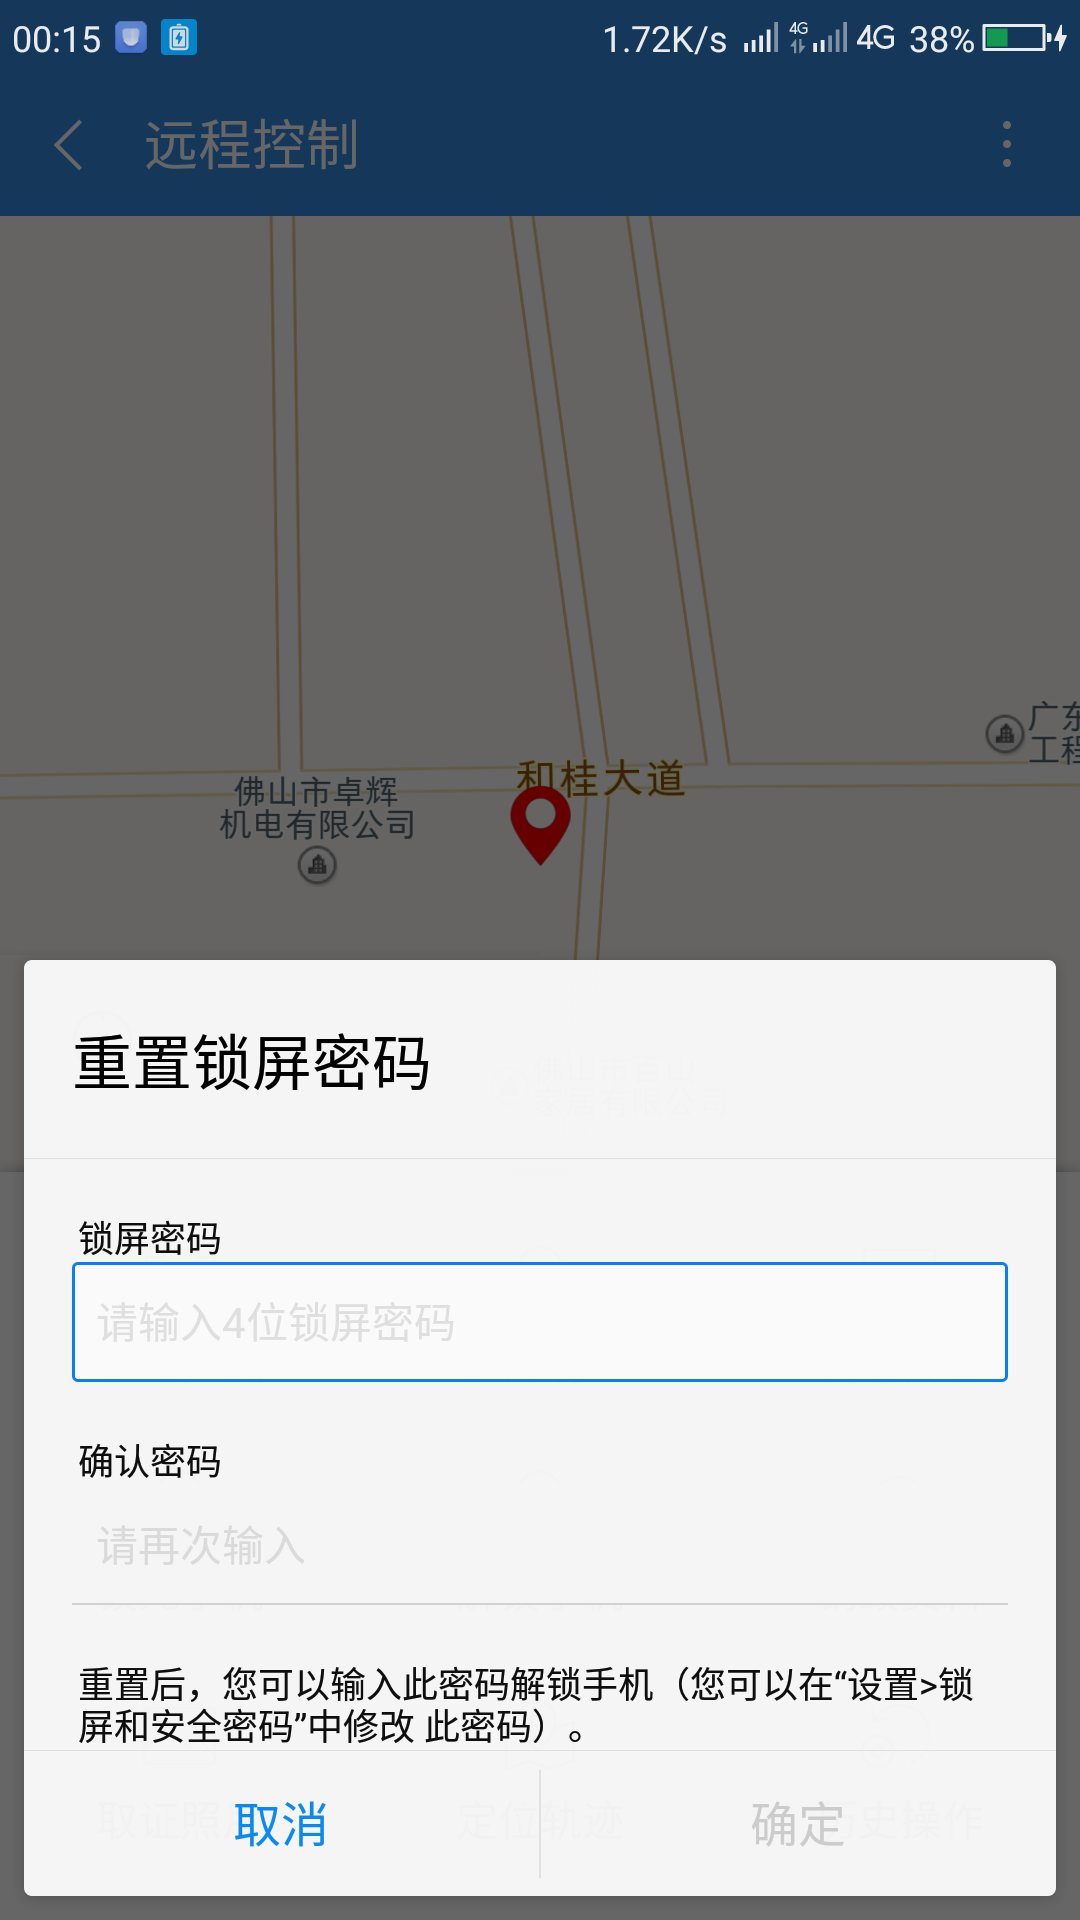 Screenshot_2018-01-20-00-15-49.png